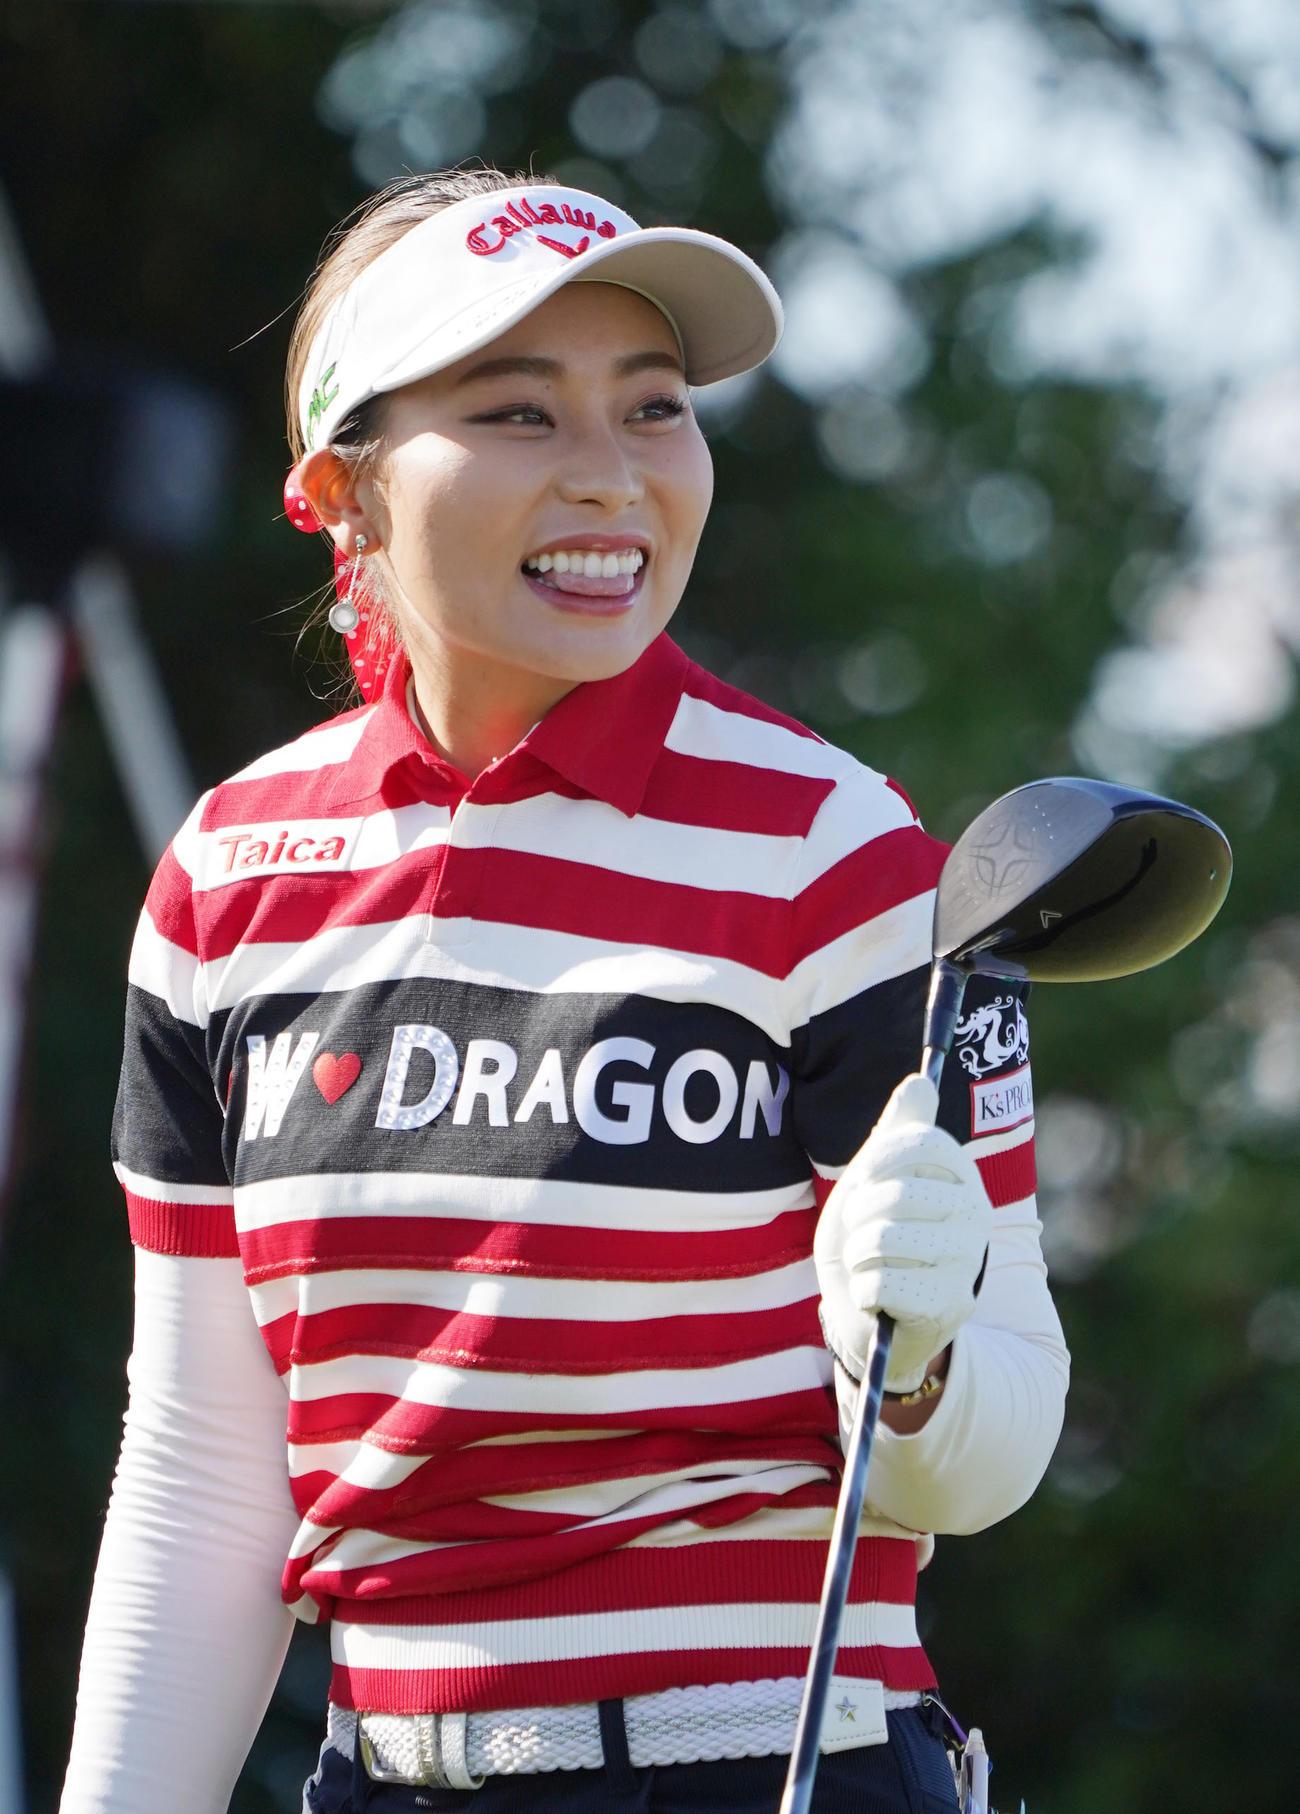 https://www.nikkansports.com/sports/golf/news/img/202103130000050-w1300_5.jpg